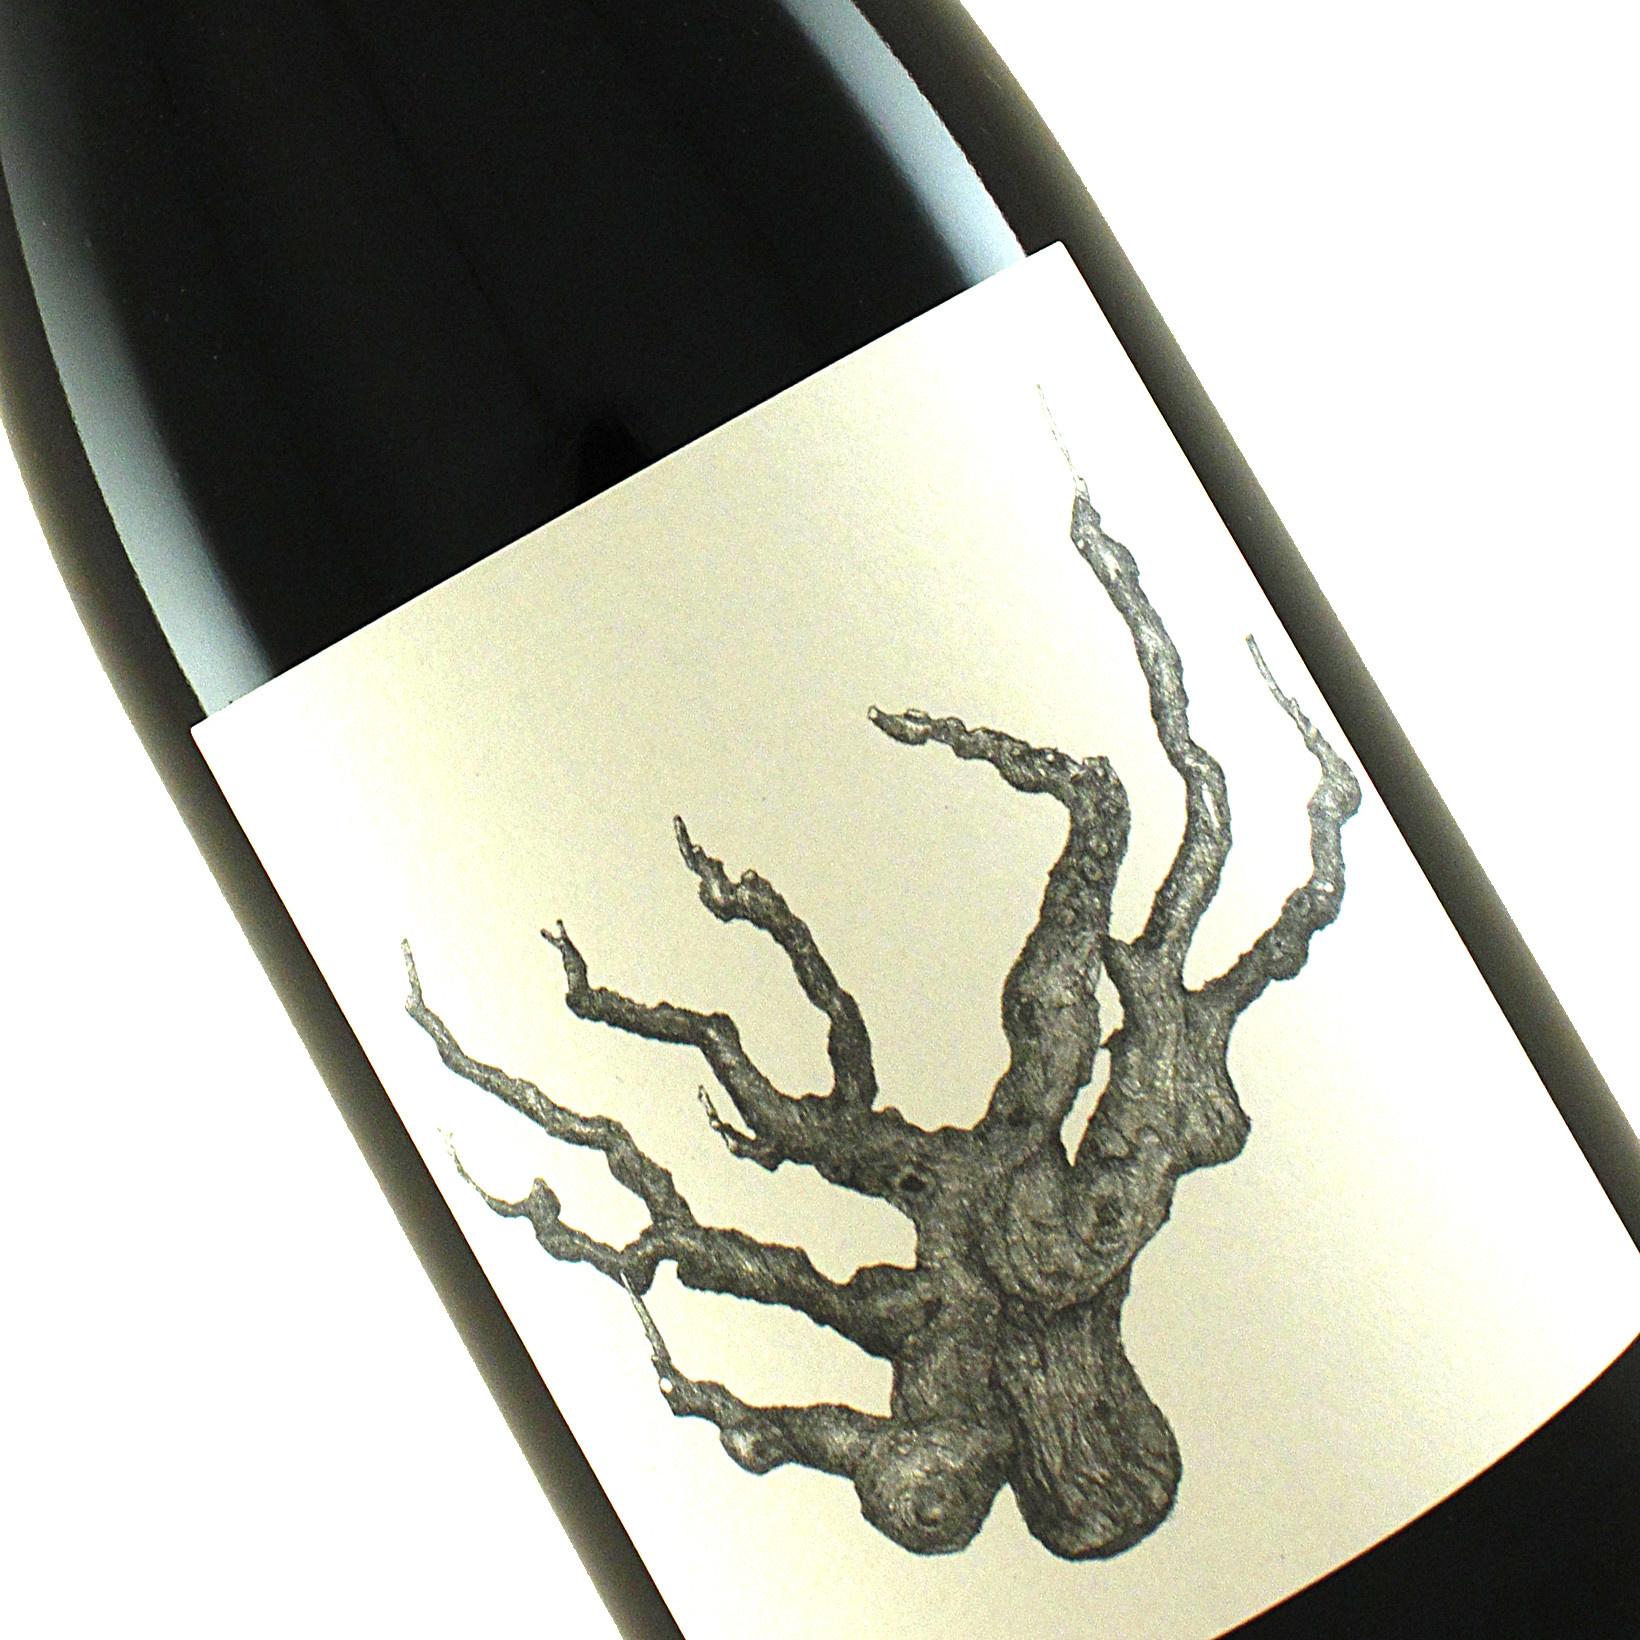 Broc Cellars 2017 Old Vine Carignan Alexander Valley